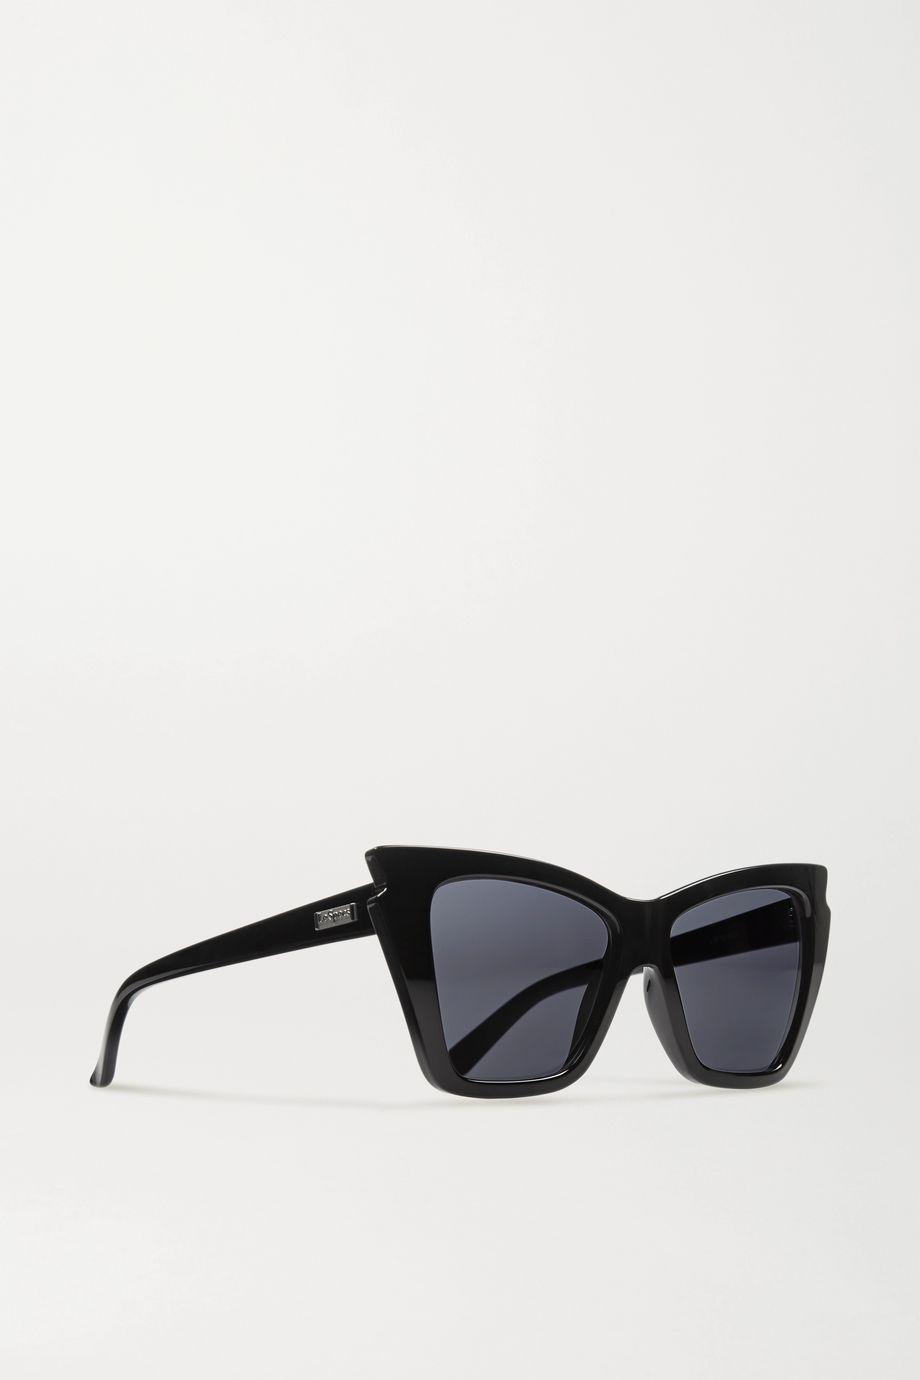 Le Specs Rapture 猫眼板材太阳镜